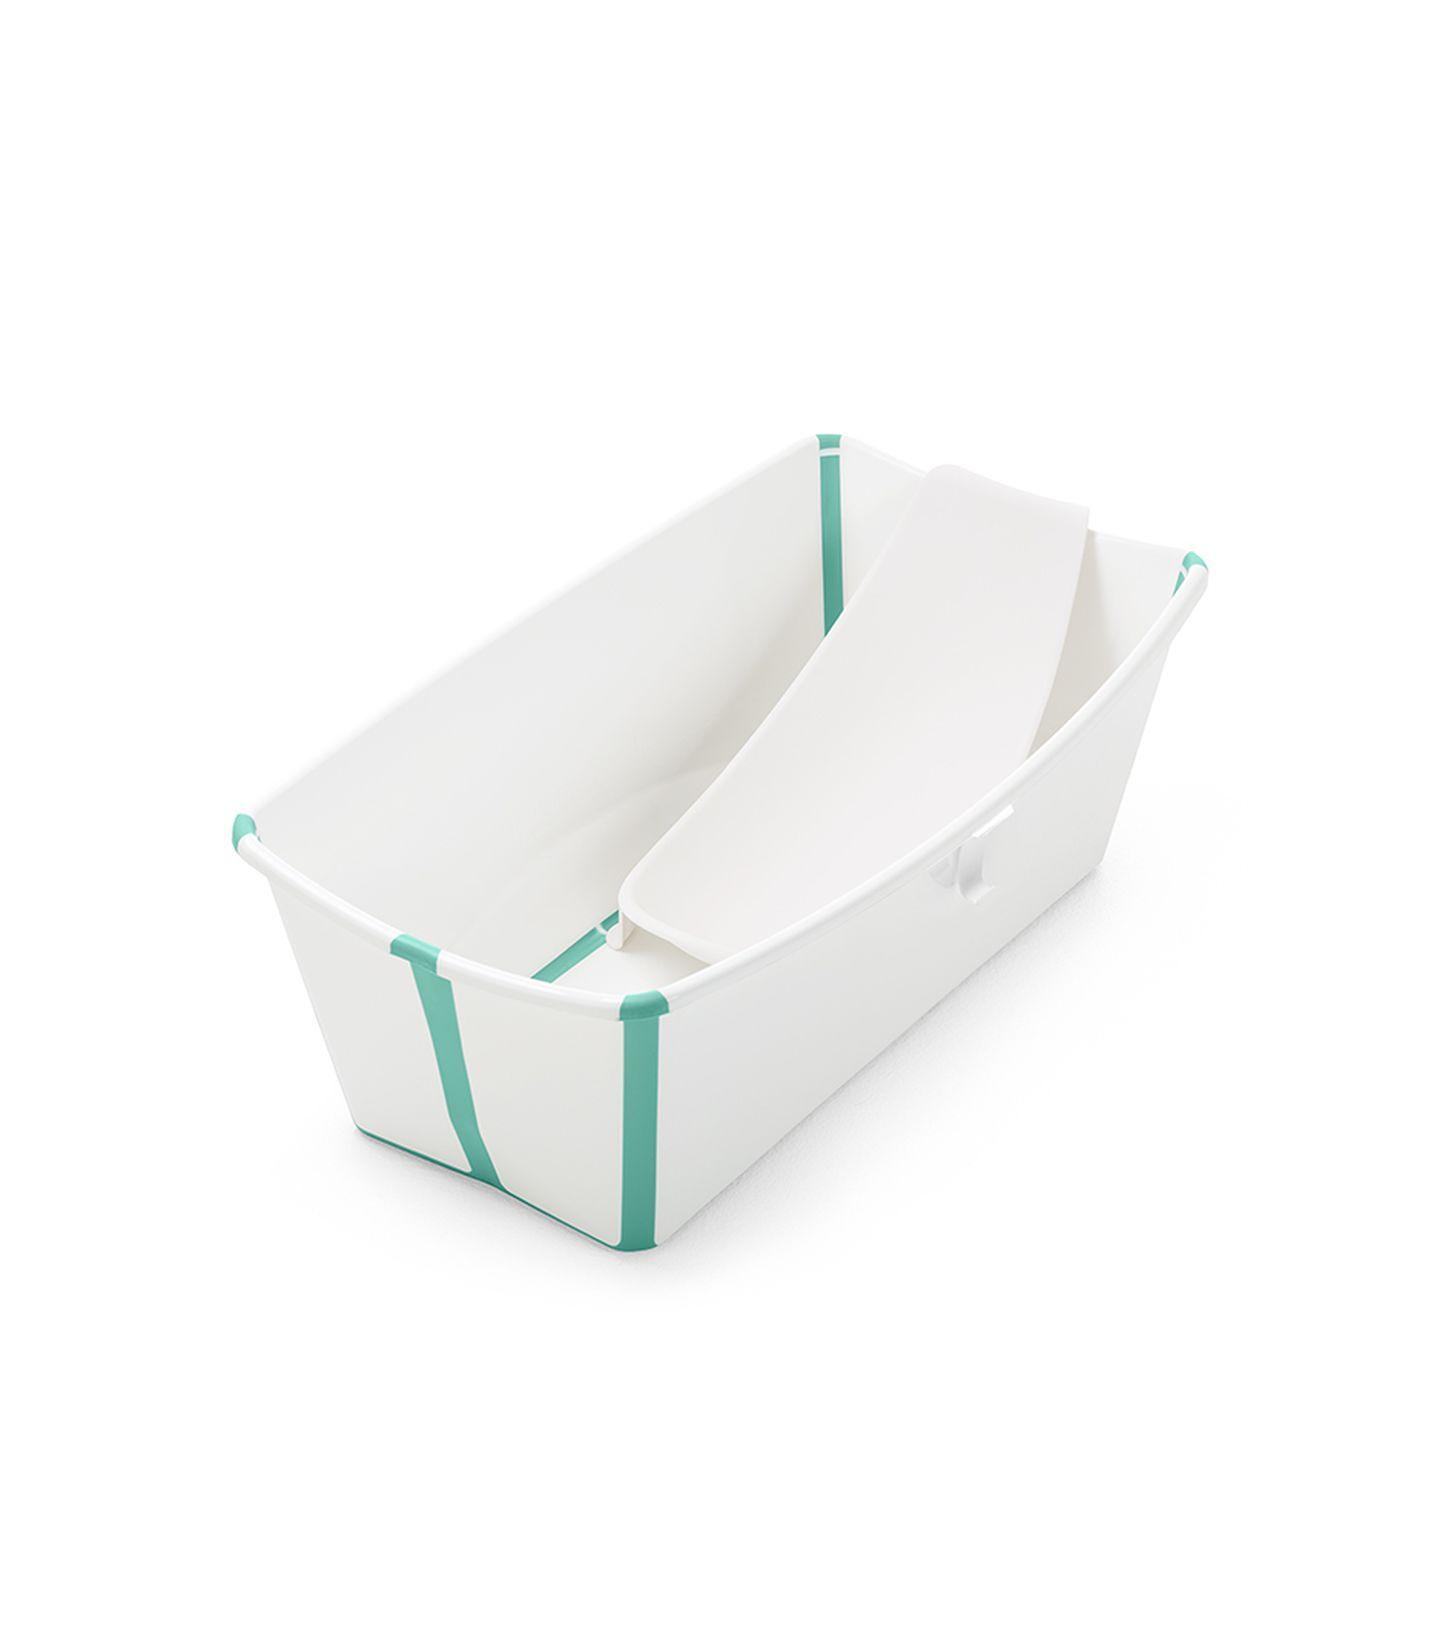 Stokke Flexi Bath Bundle με υποστήριξη και θερμοευαίσθητη βαλβίδα White Aqua